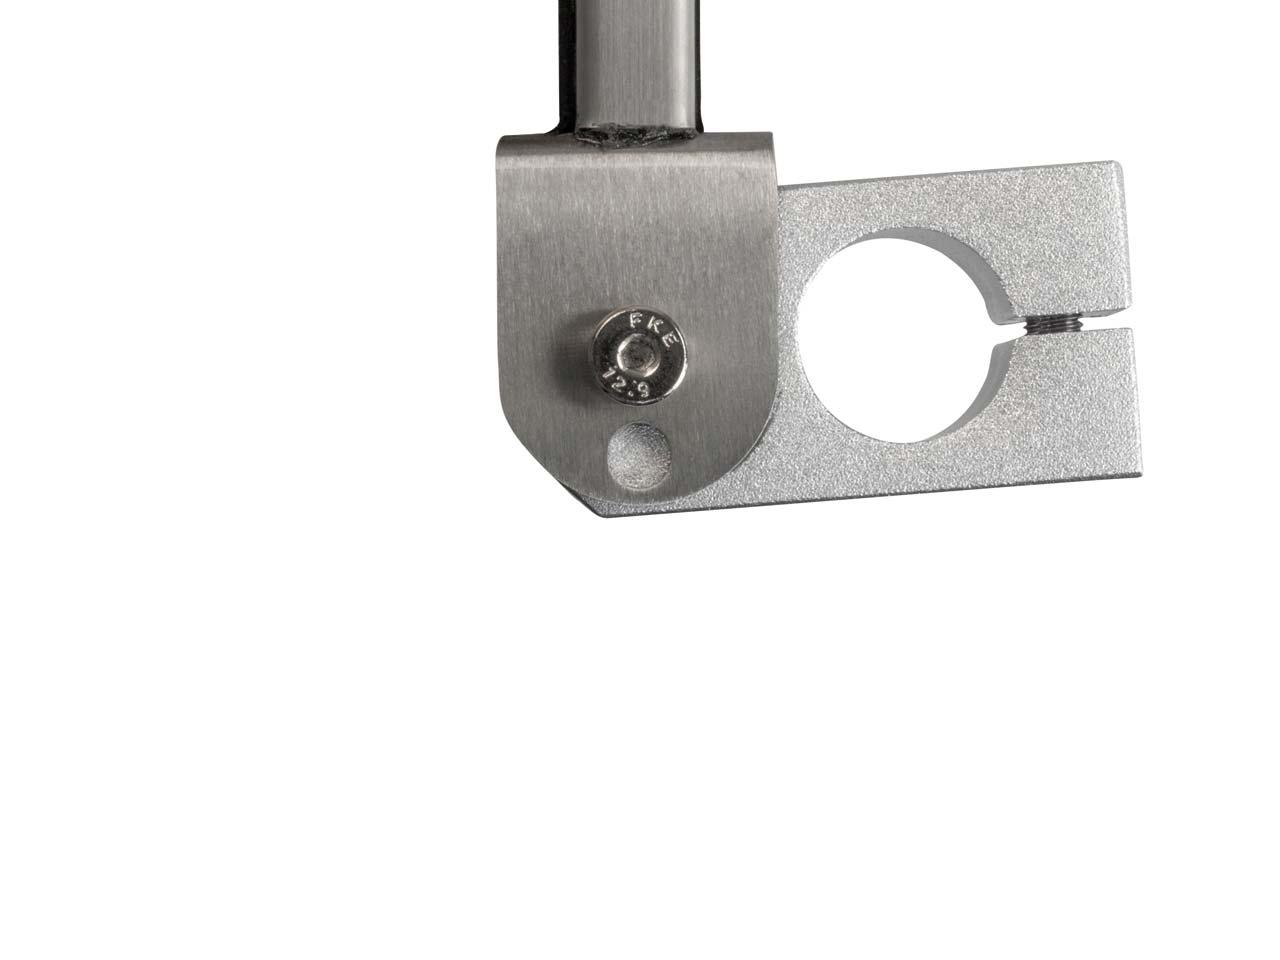 Genuine-US-Foredom-Workbench-Accessories-System miniatura 56